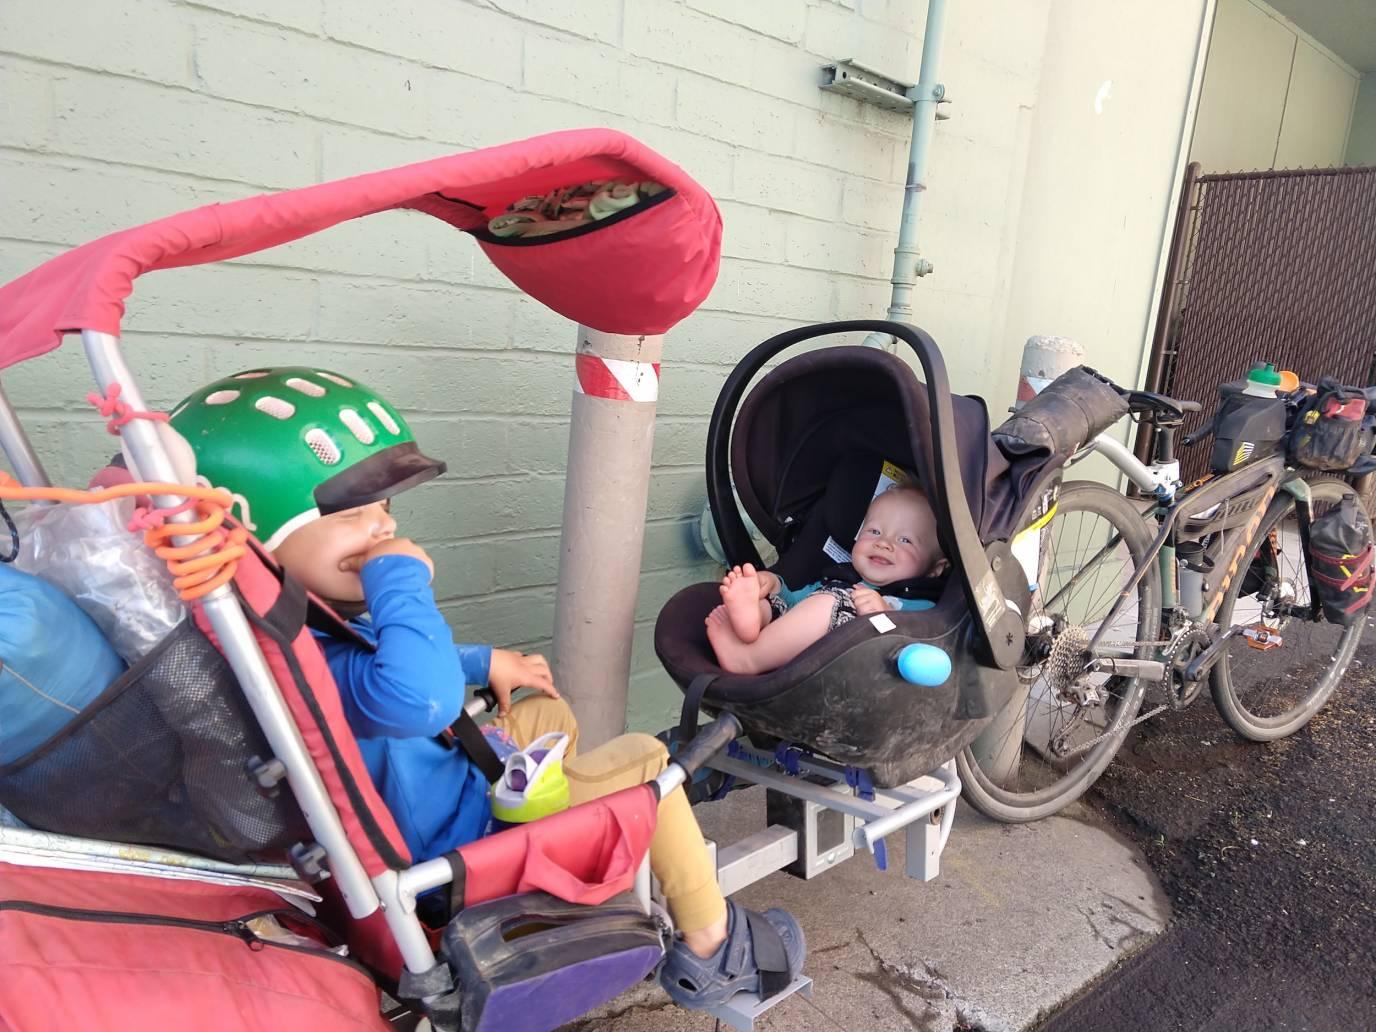 Bikepacking Gear - Family Adventure